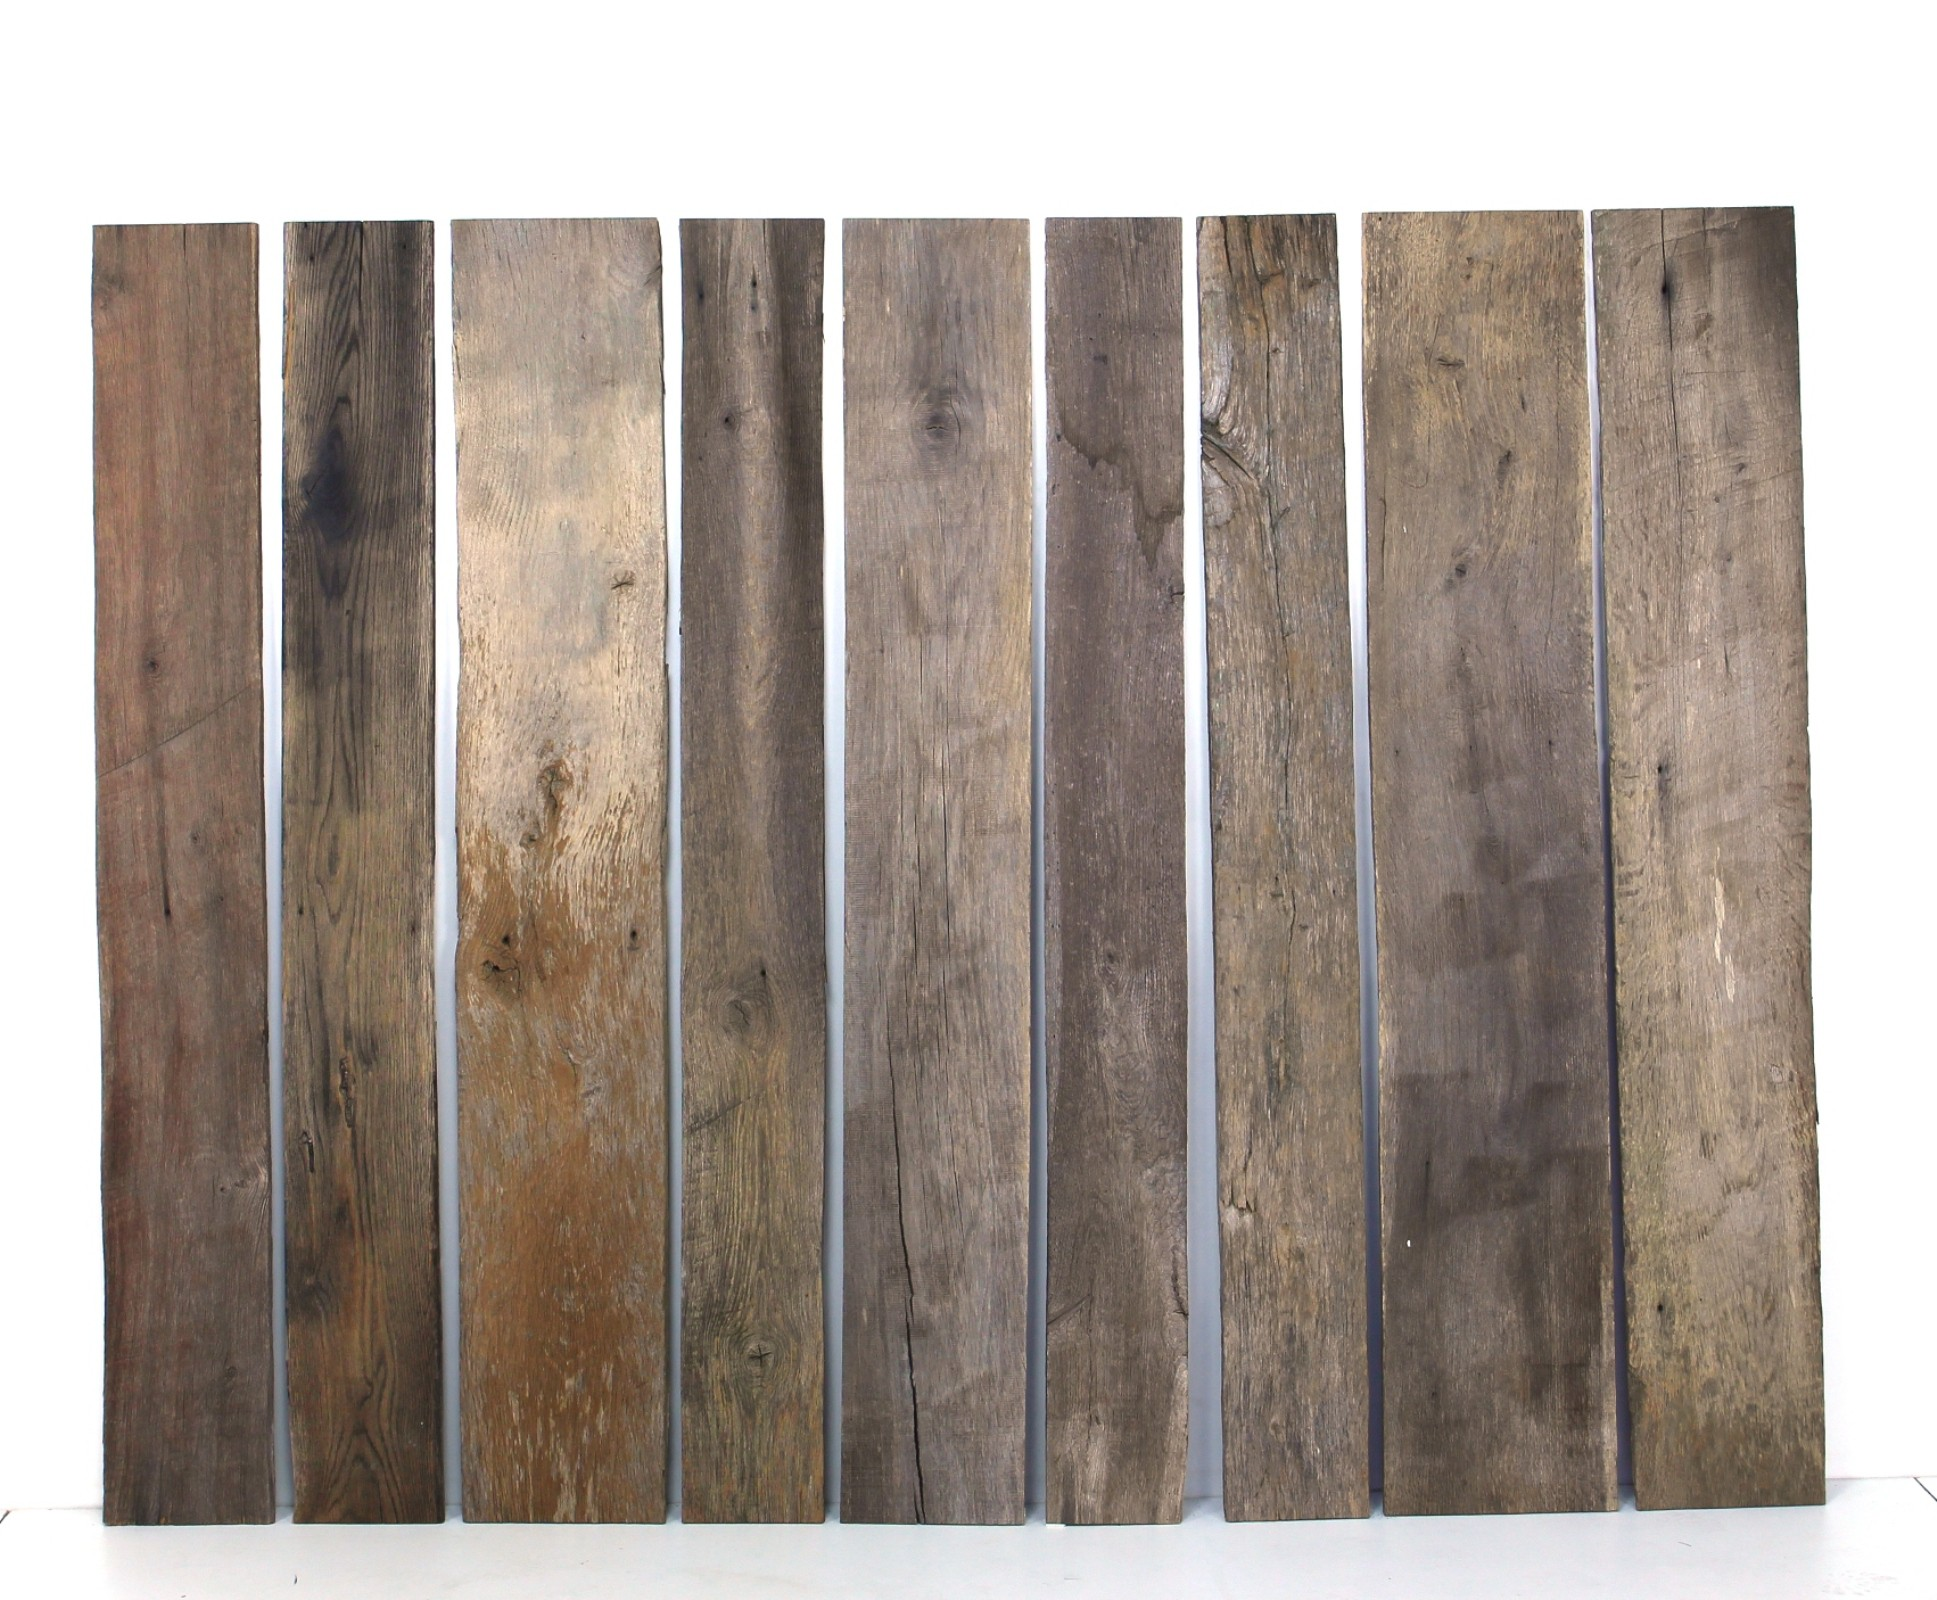 Holzbretter aus Eiche sonnenverbrannt